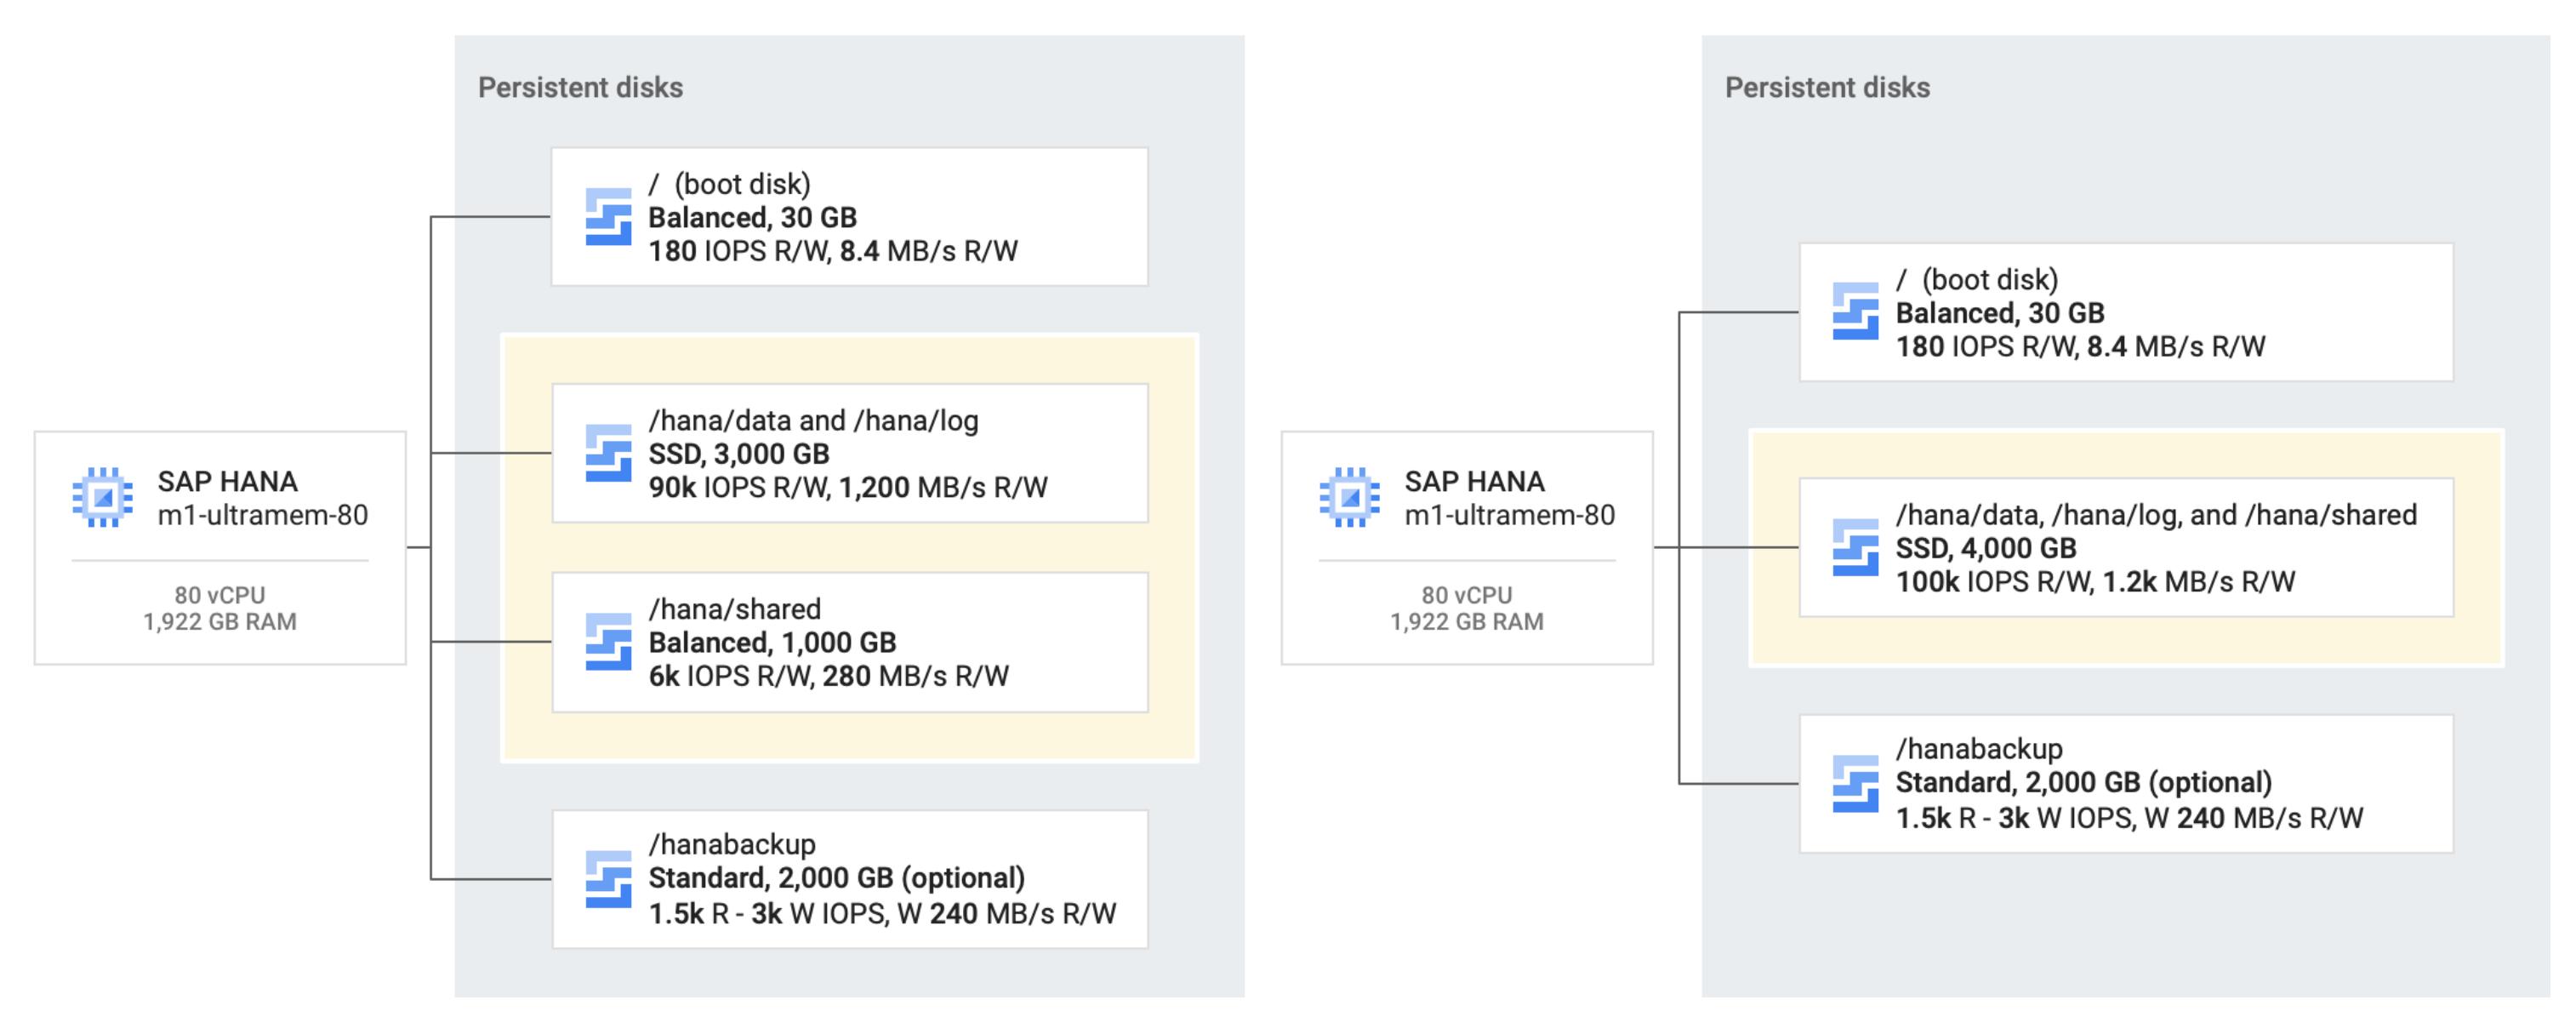 SAP HANA 시스템 두 개가 표시됩니다. 왼쪽 시스템에서는 자체 균형 있는 영구 디스크에 `/hana/shared`, SSD 영구 디스크에 `/hana/data` 및 `/hana/log`가 함께 있습니다. 다른 시스템에서는 SSD 영구 디스크 하나에 `/hana/data`, `/hana/log`, `/hana/shared`가 함께 있으며 이 아키텍처가 권장 아키텍처입니다.